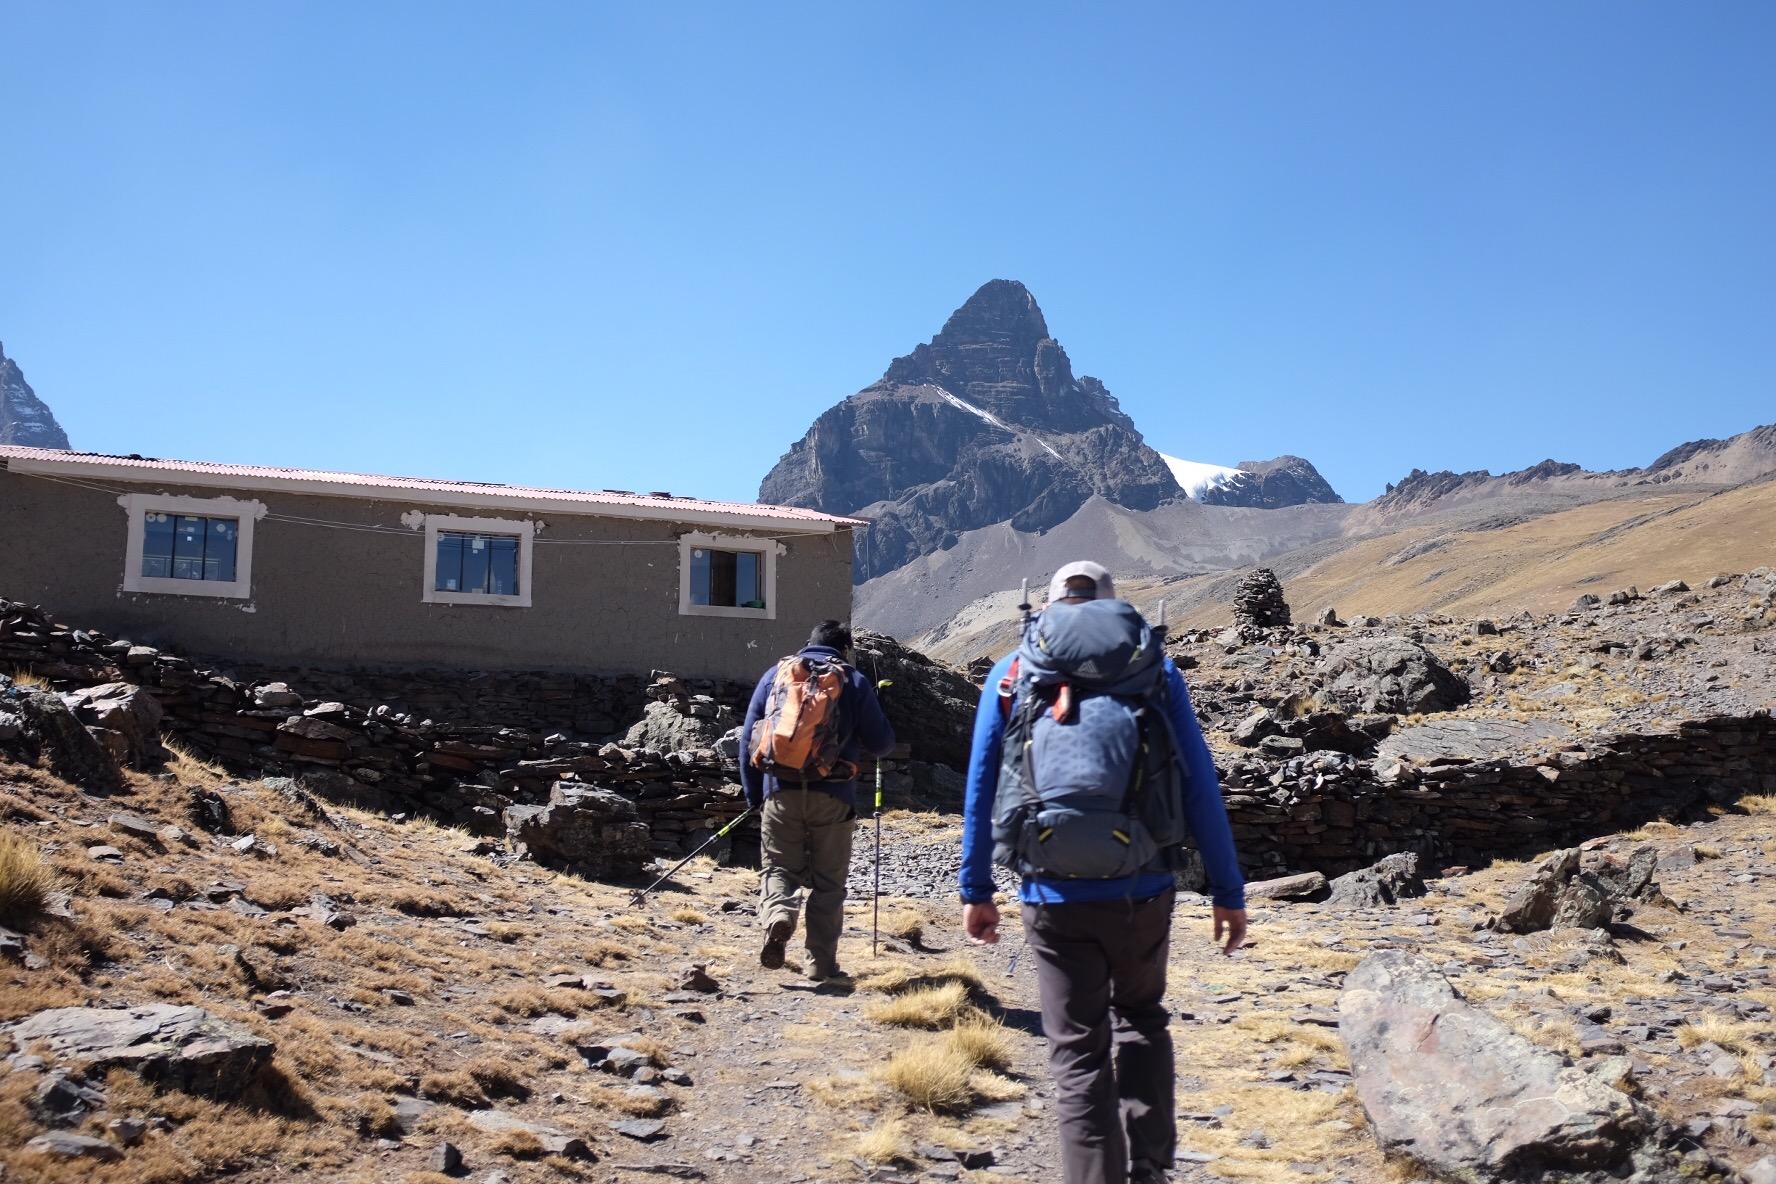 Arriving at Condoriri Base Camp